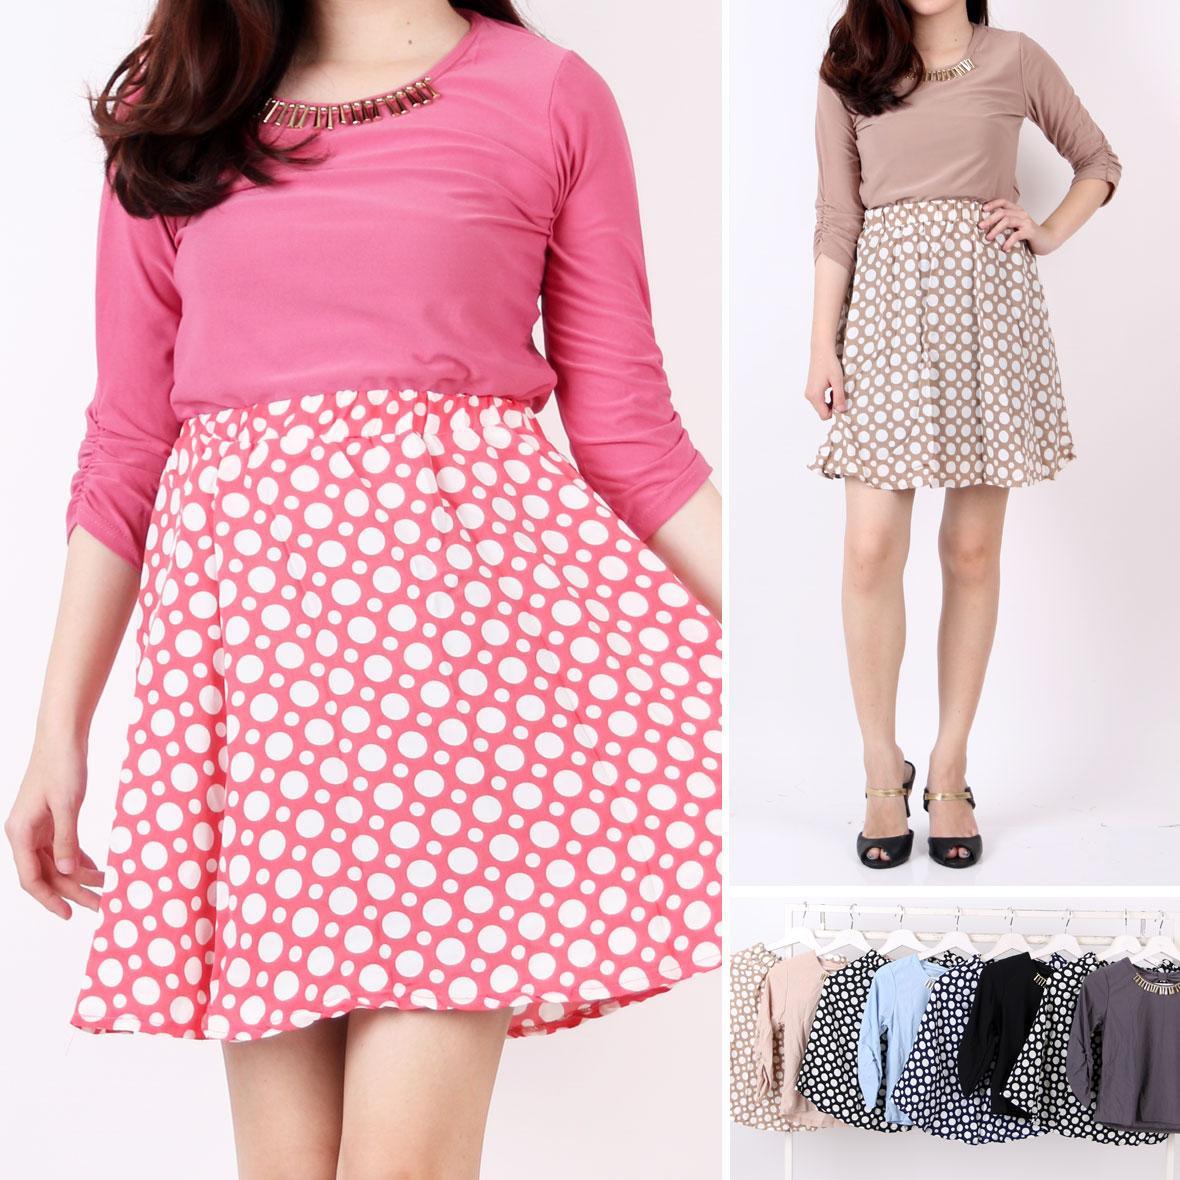 Jual Dress Merah Polkadot Murah Garansi Dan Berkualitas Id Store Macbee Kids Baju Anak Cherly Size 2 Rp 50000